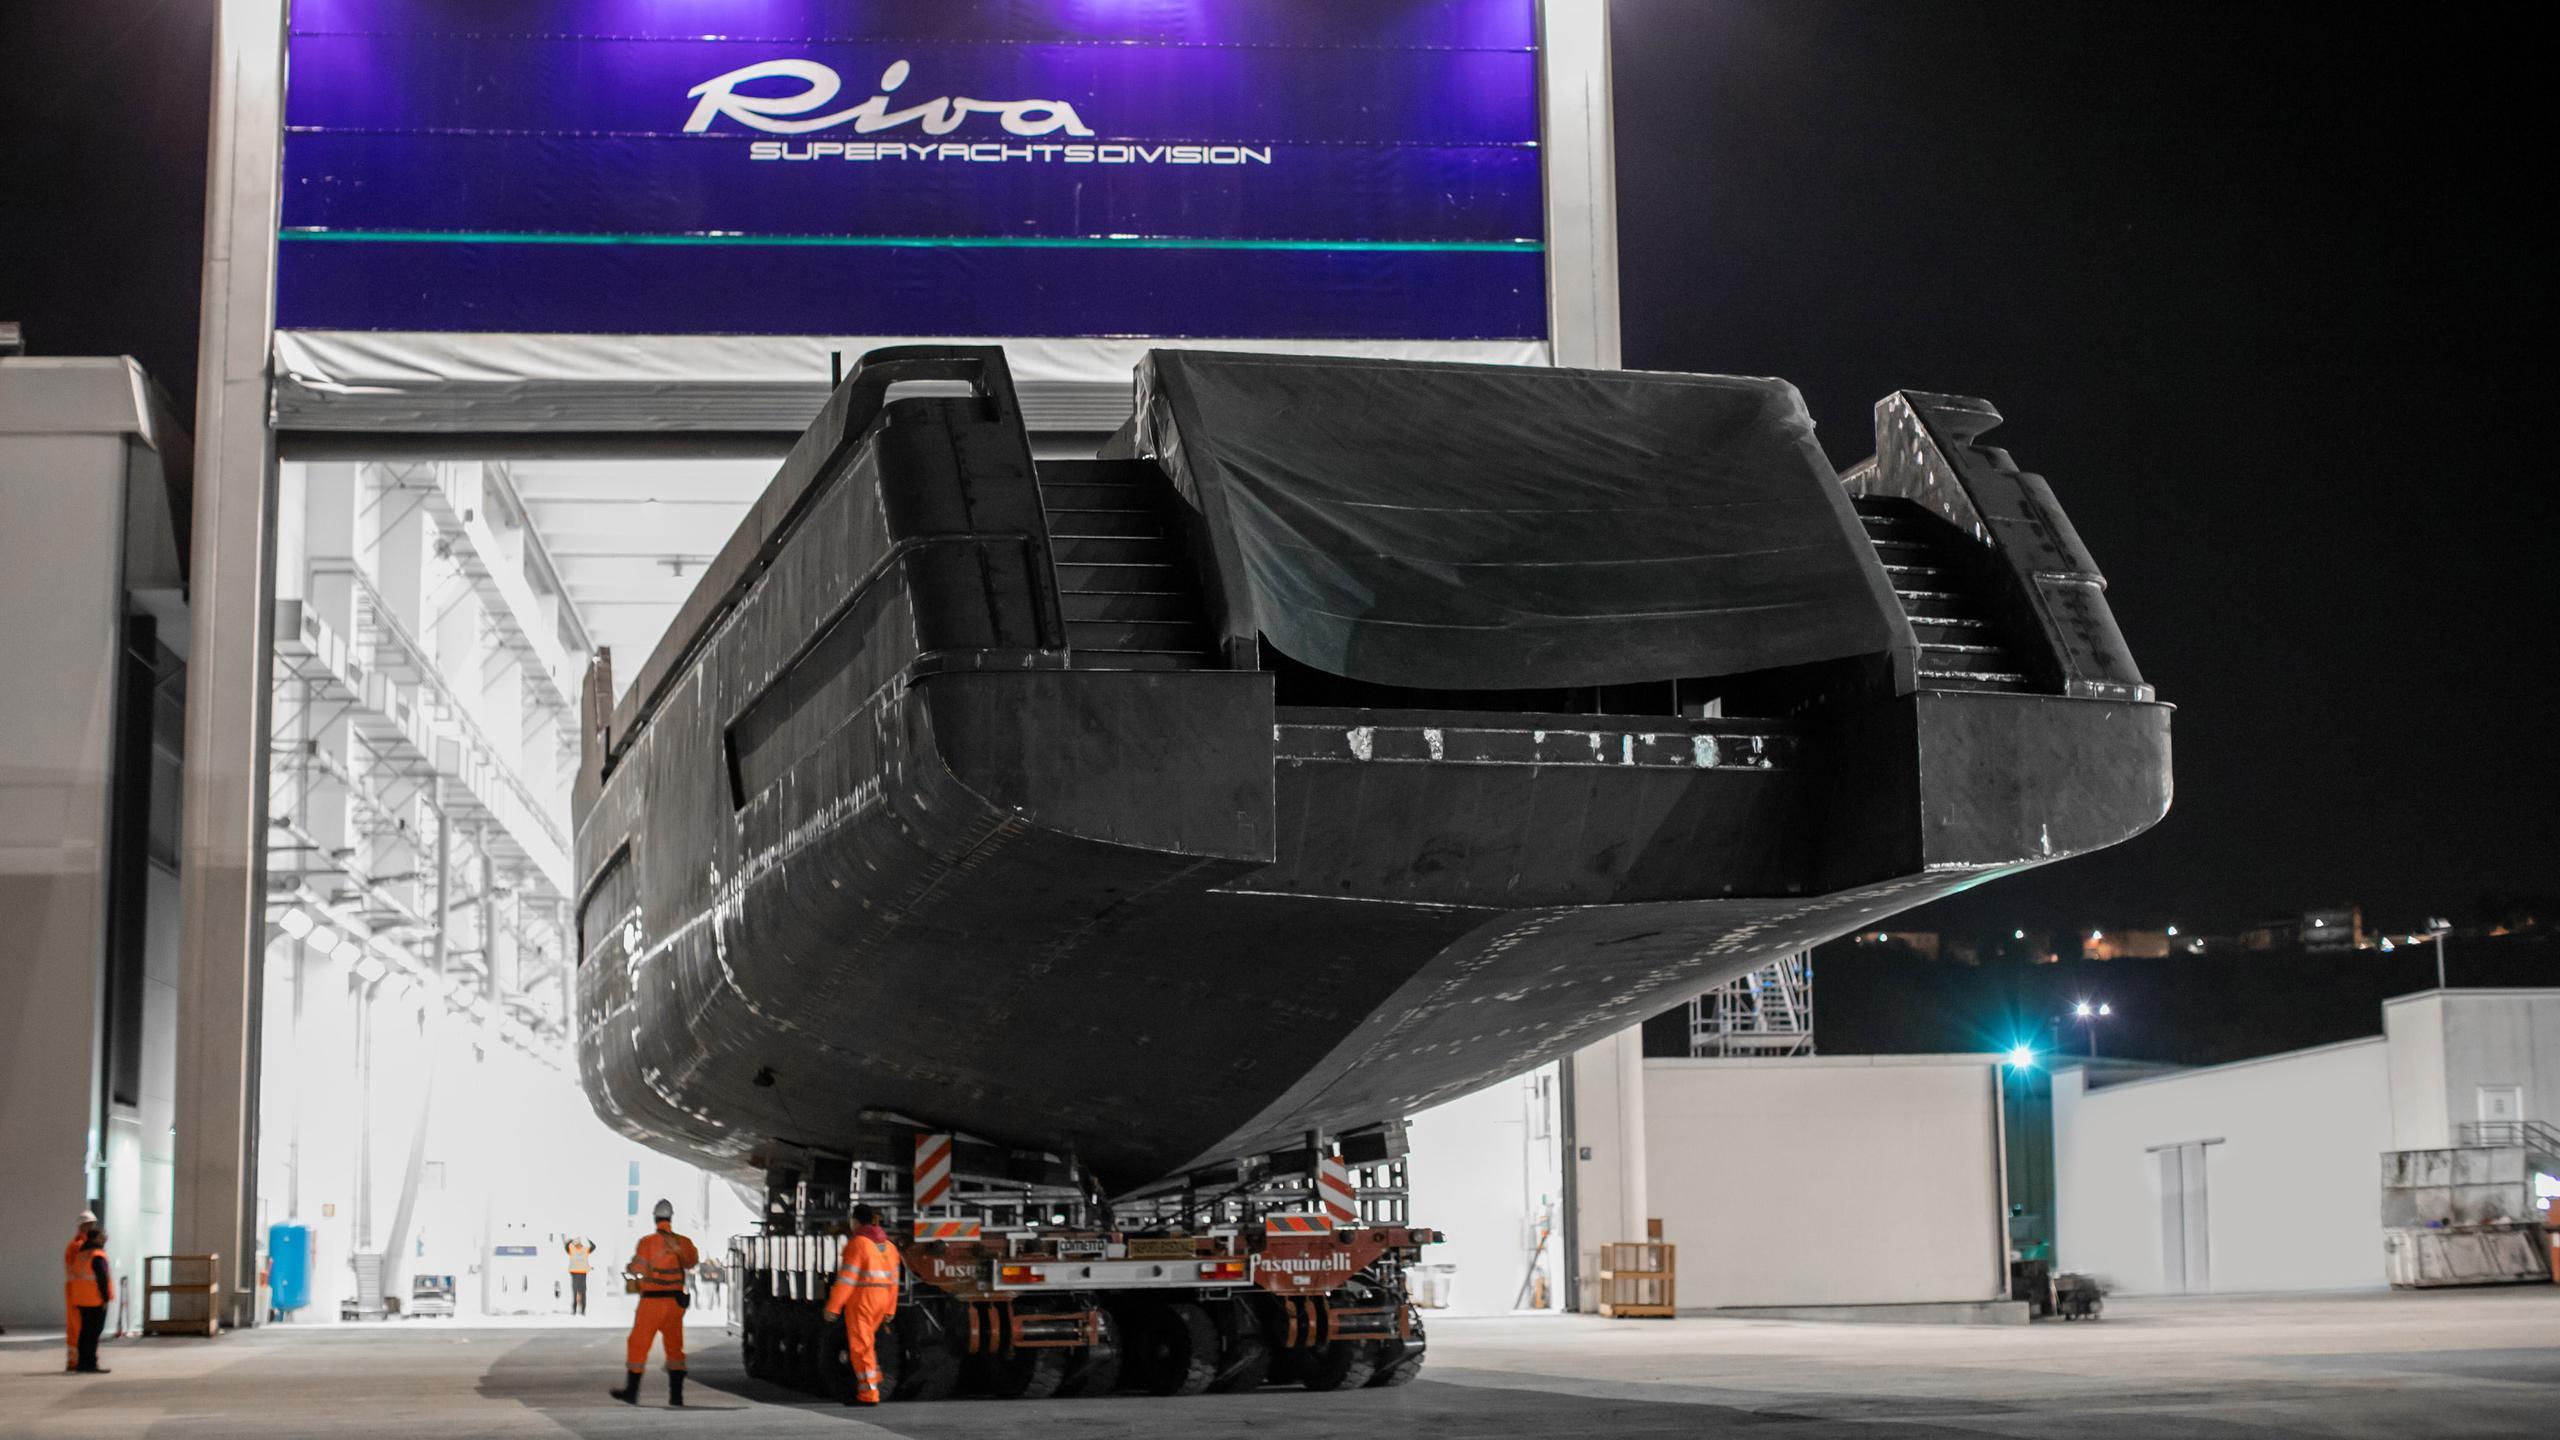 race 50m motoryacht riva yachts 50m 2019 hull stern